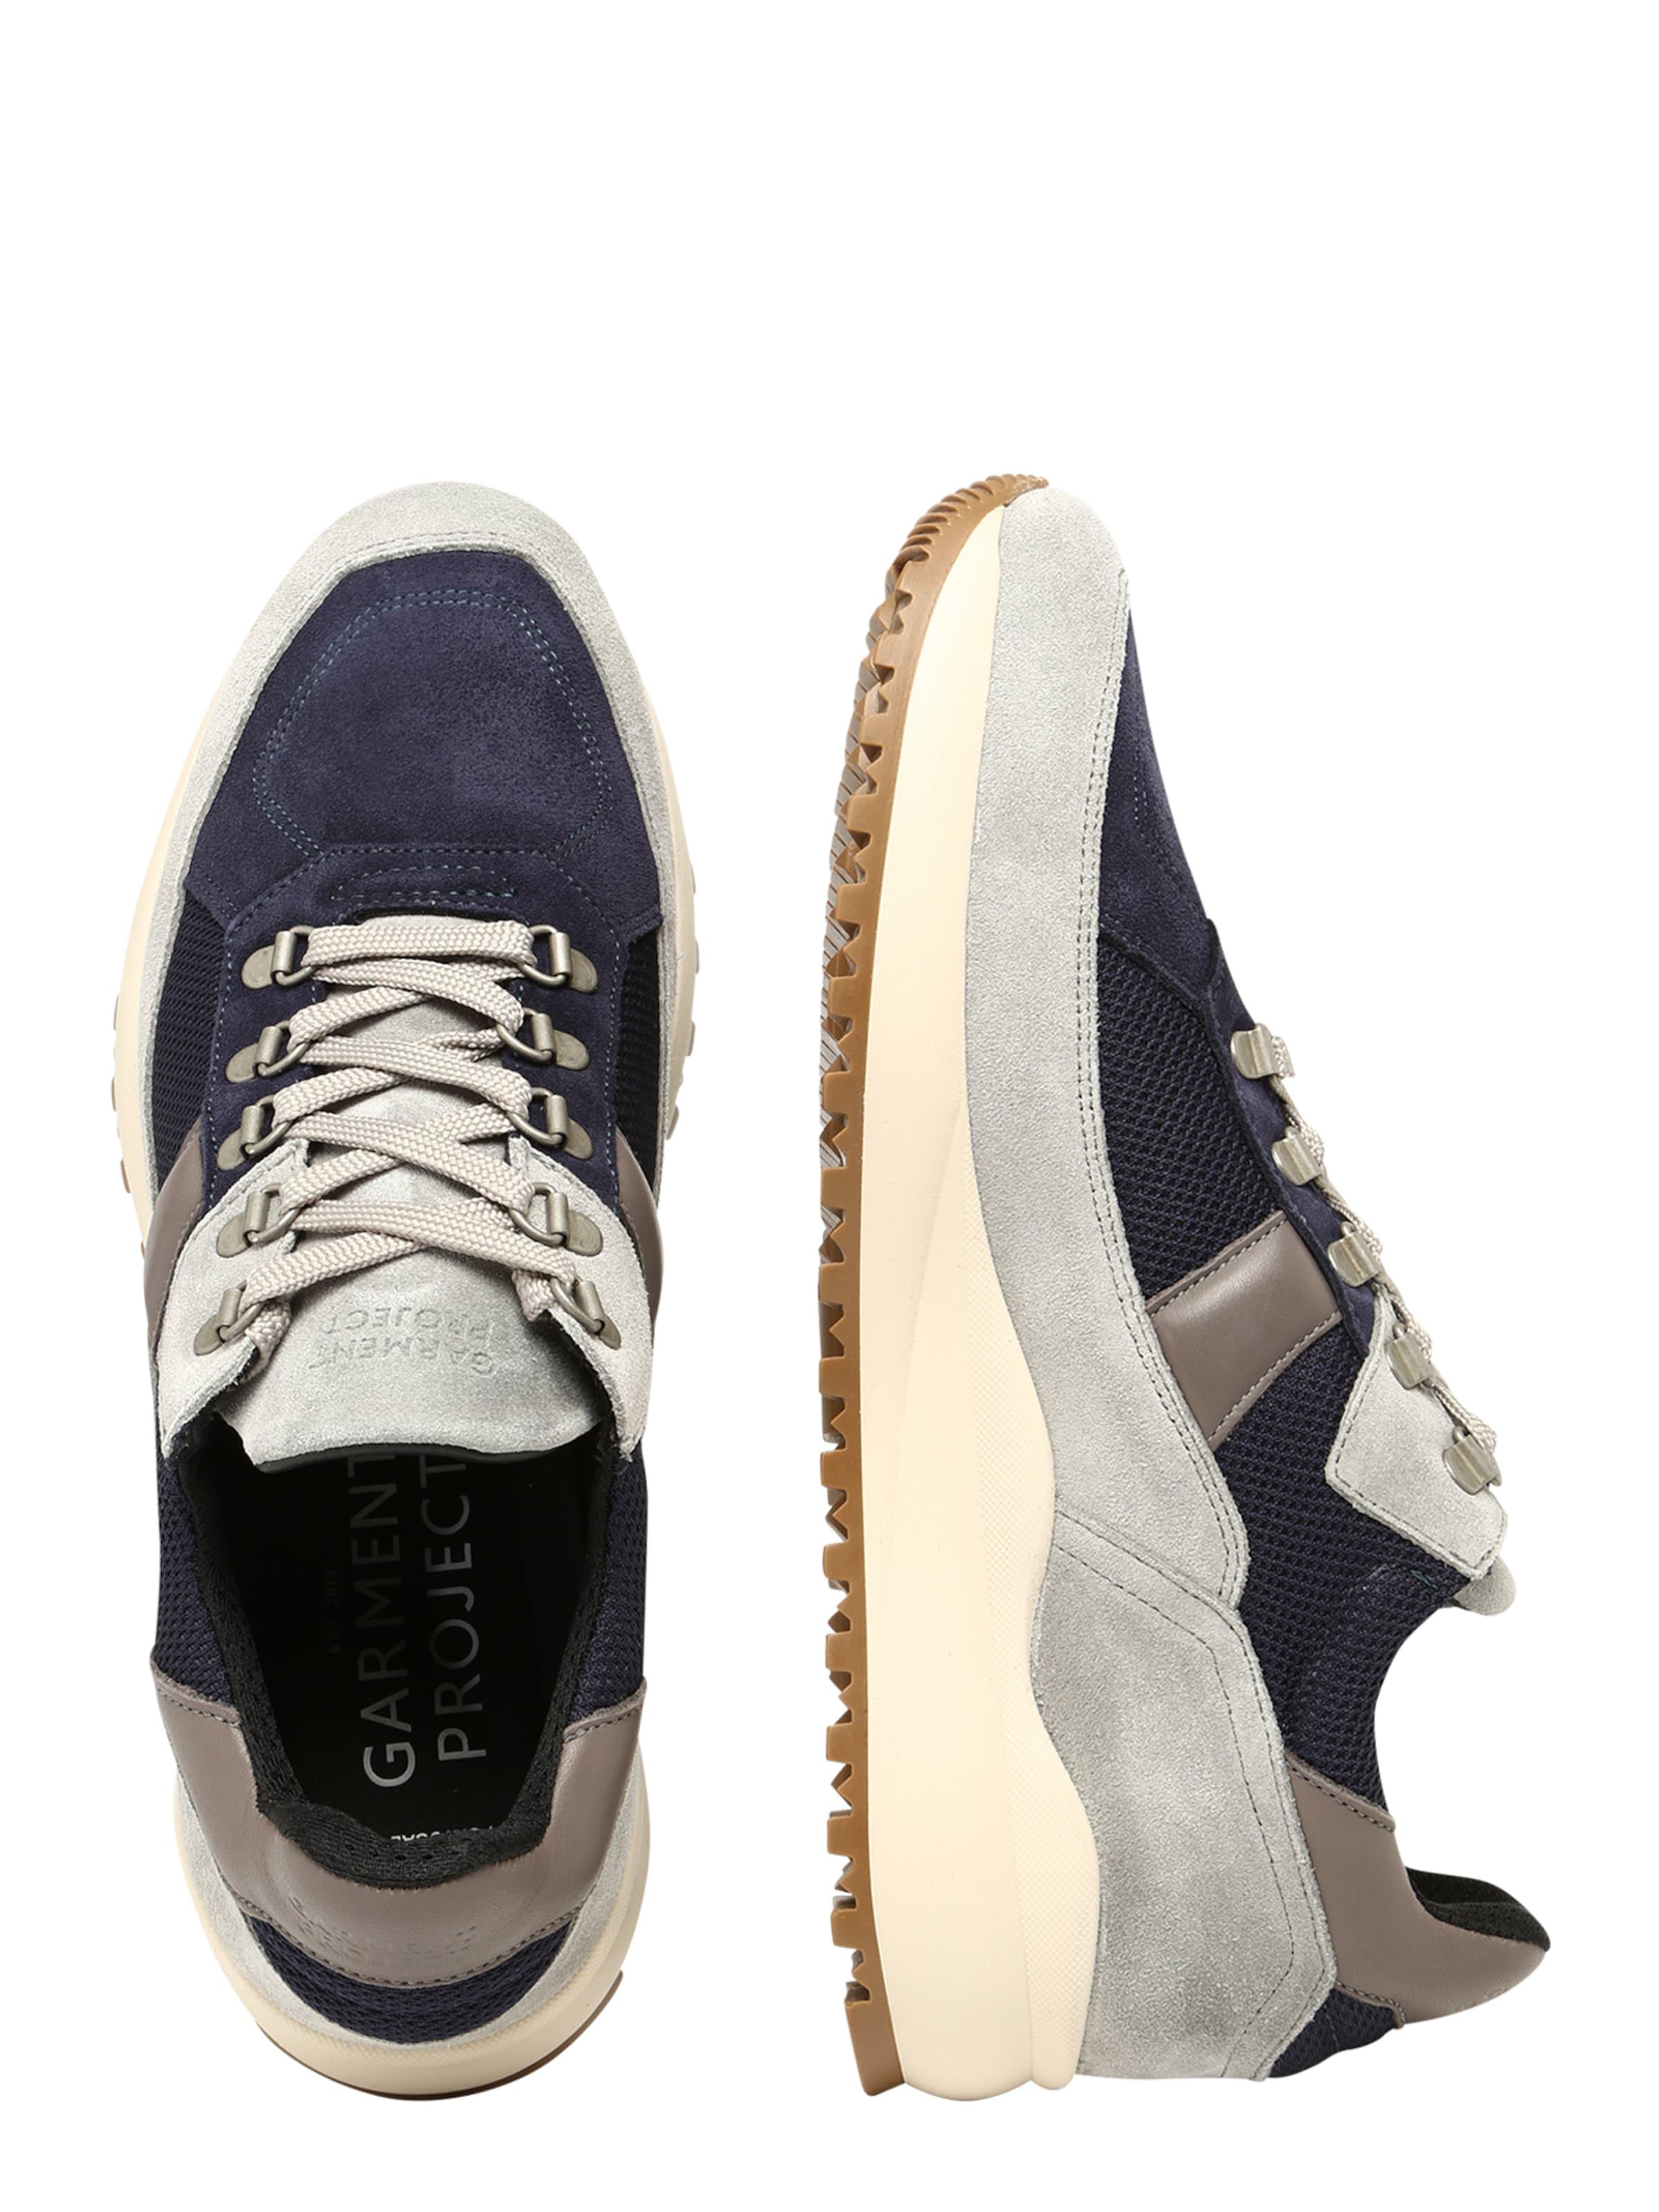 In Project Garment NavyHellgrau Sneaker 'sky' OPiZukX